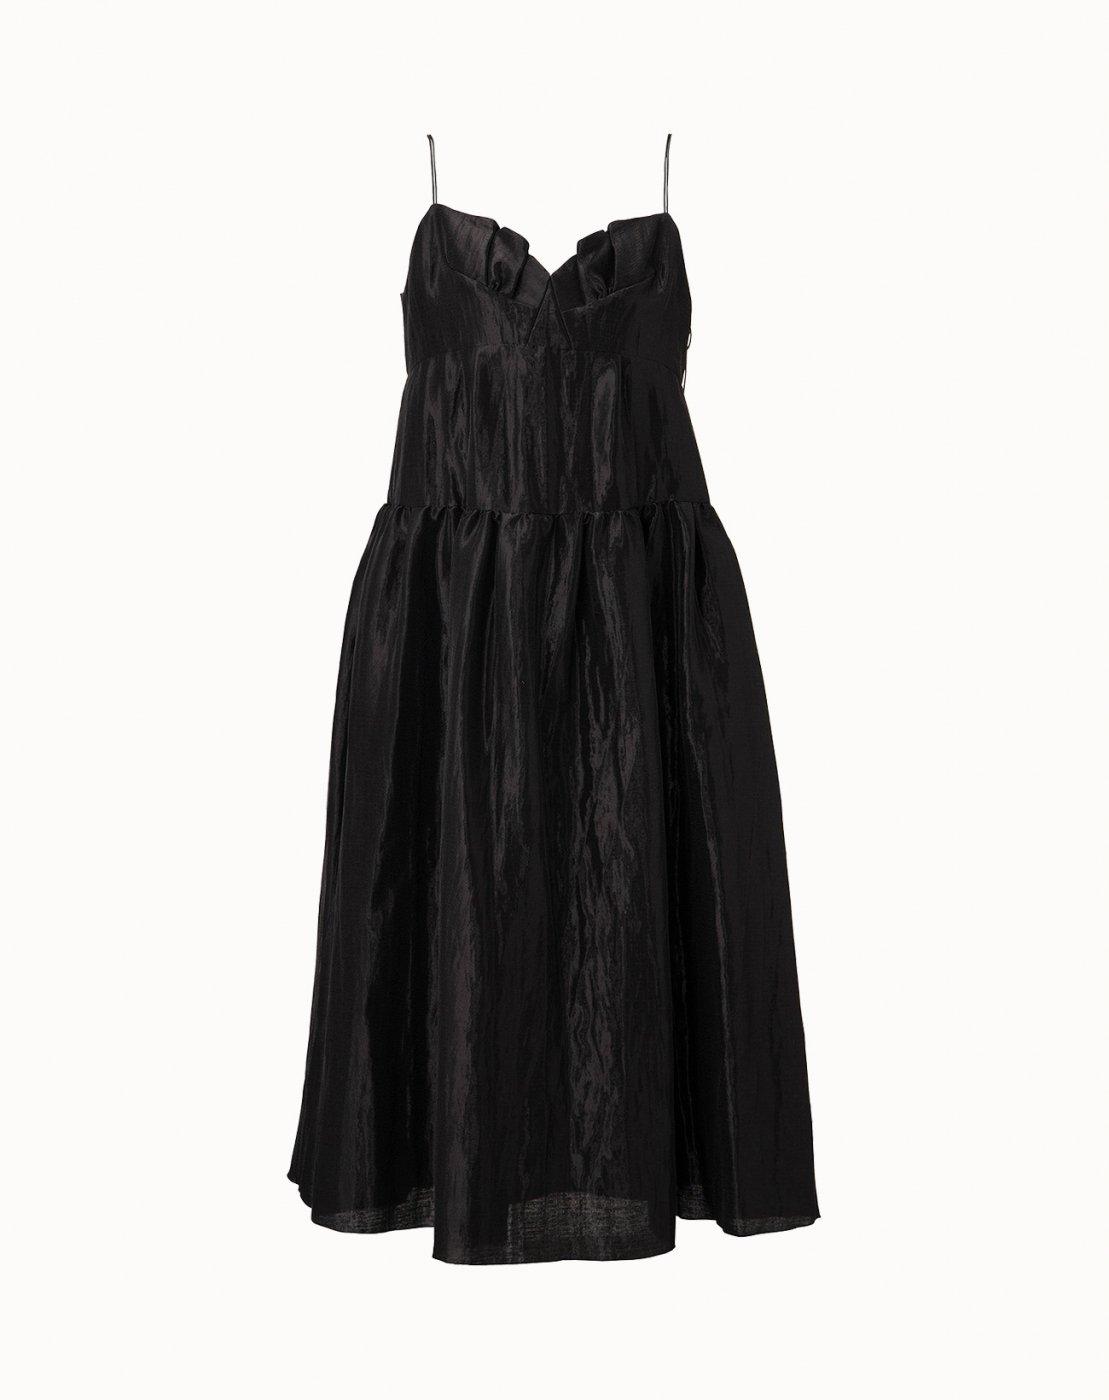 leur logette - Pearl Cloth Dress - Black